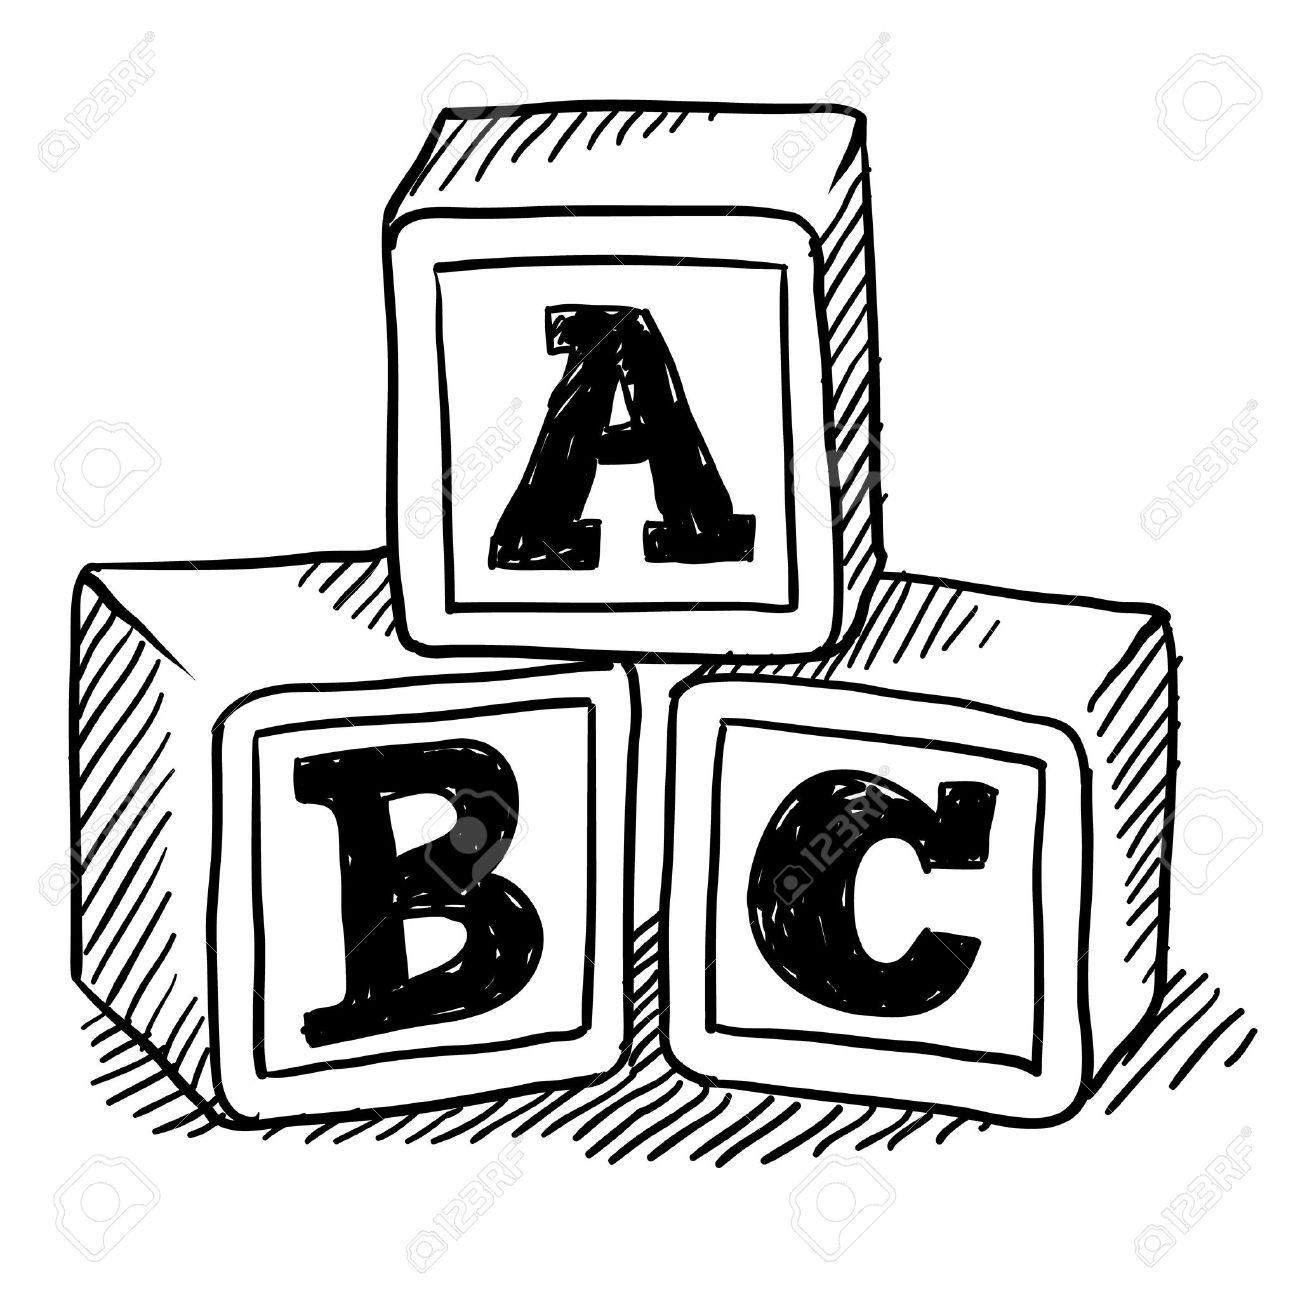 1300x1300 Abc Blocks Free Black And White Stock